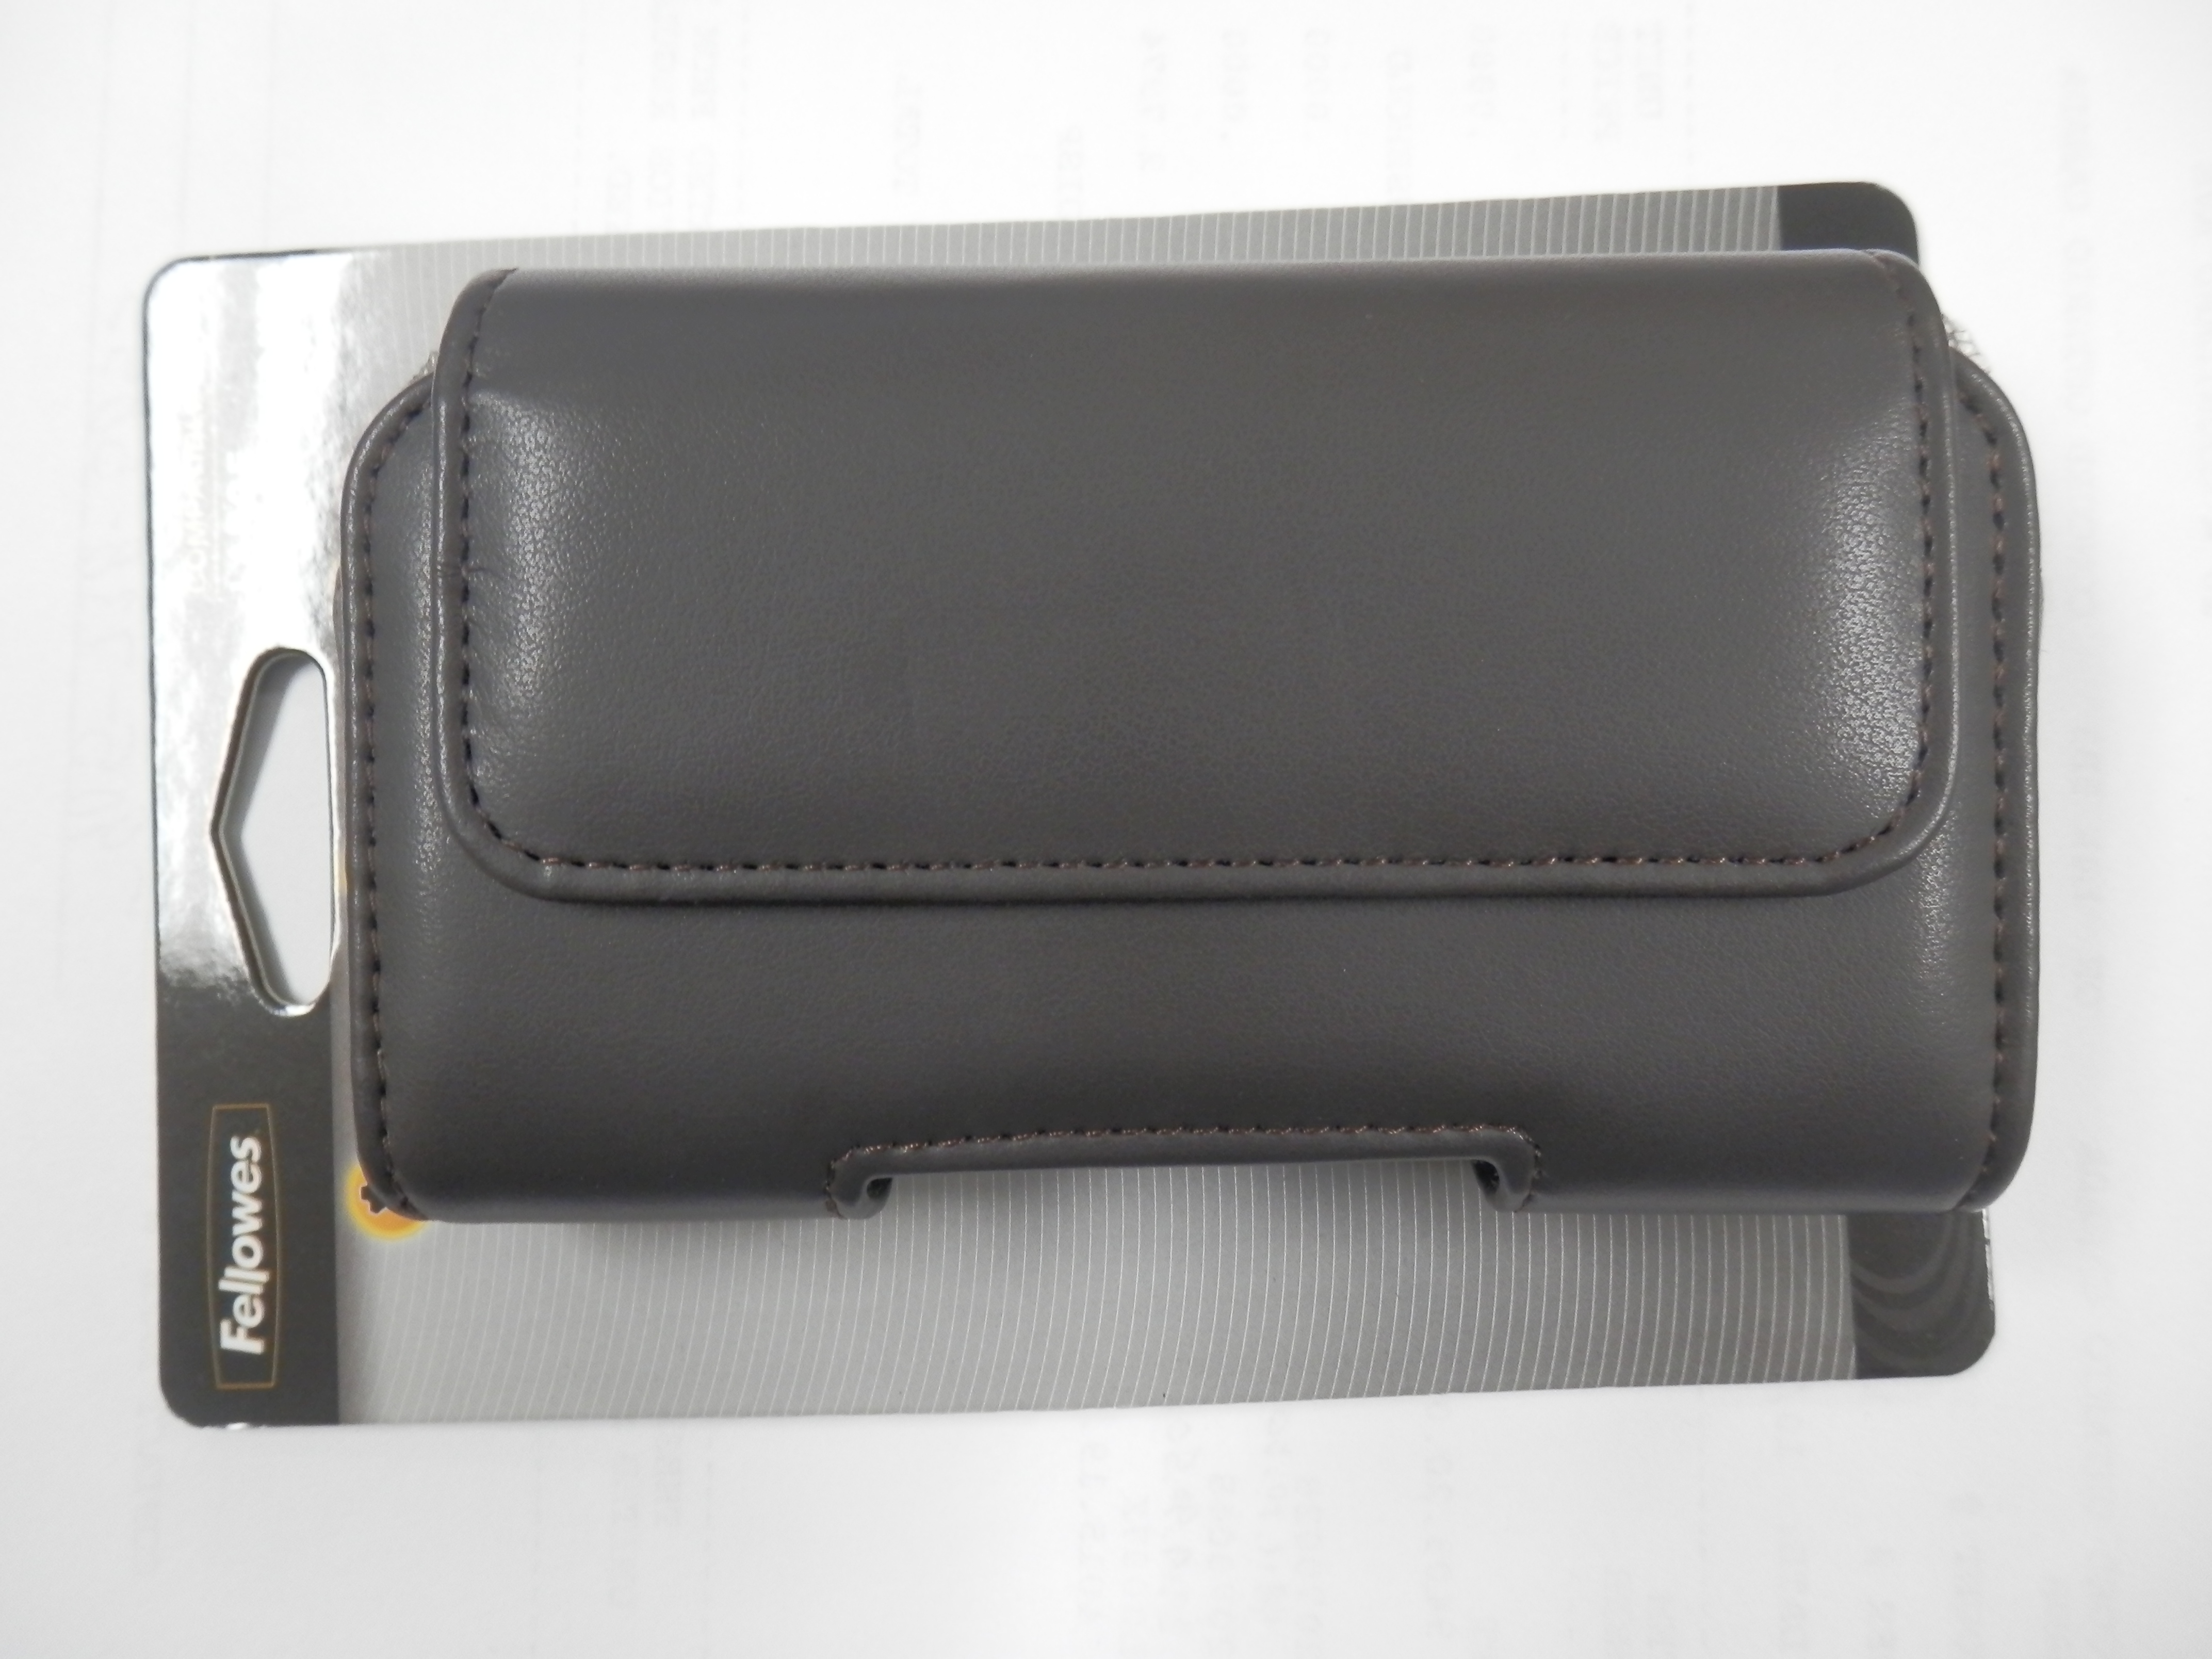 Body Glove Landmark Universal Horizontal Case for Apple iPhone 5s Chocolate by Body Glove